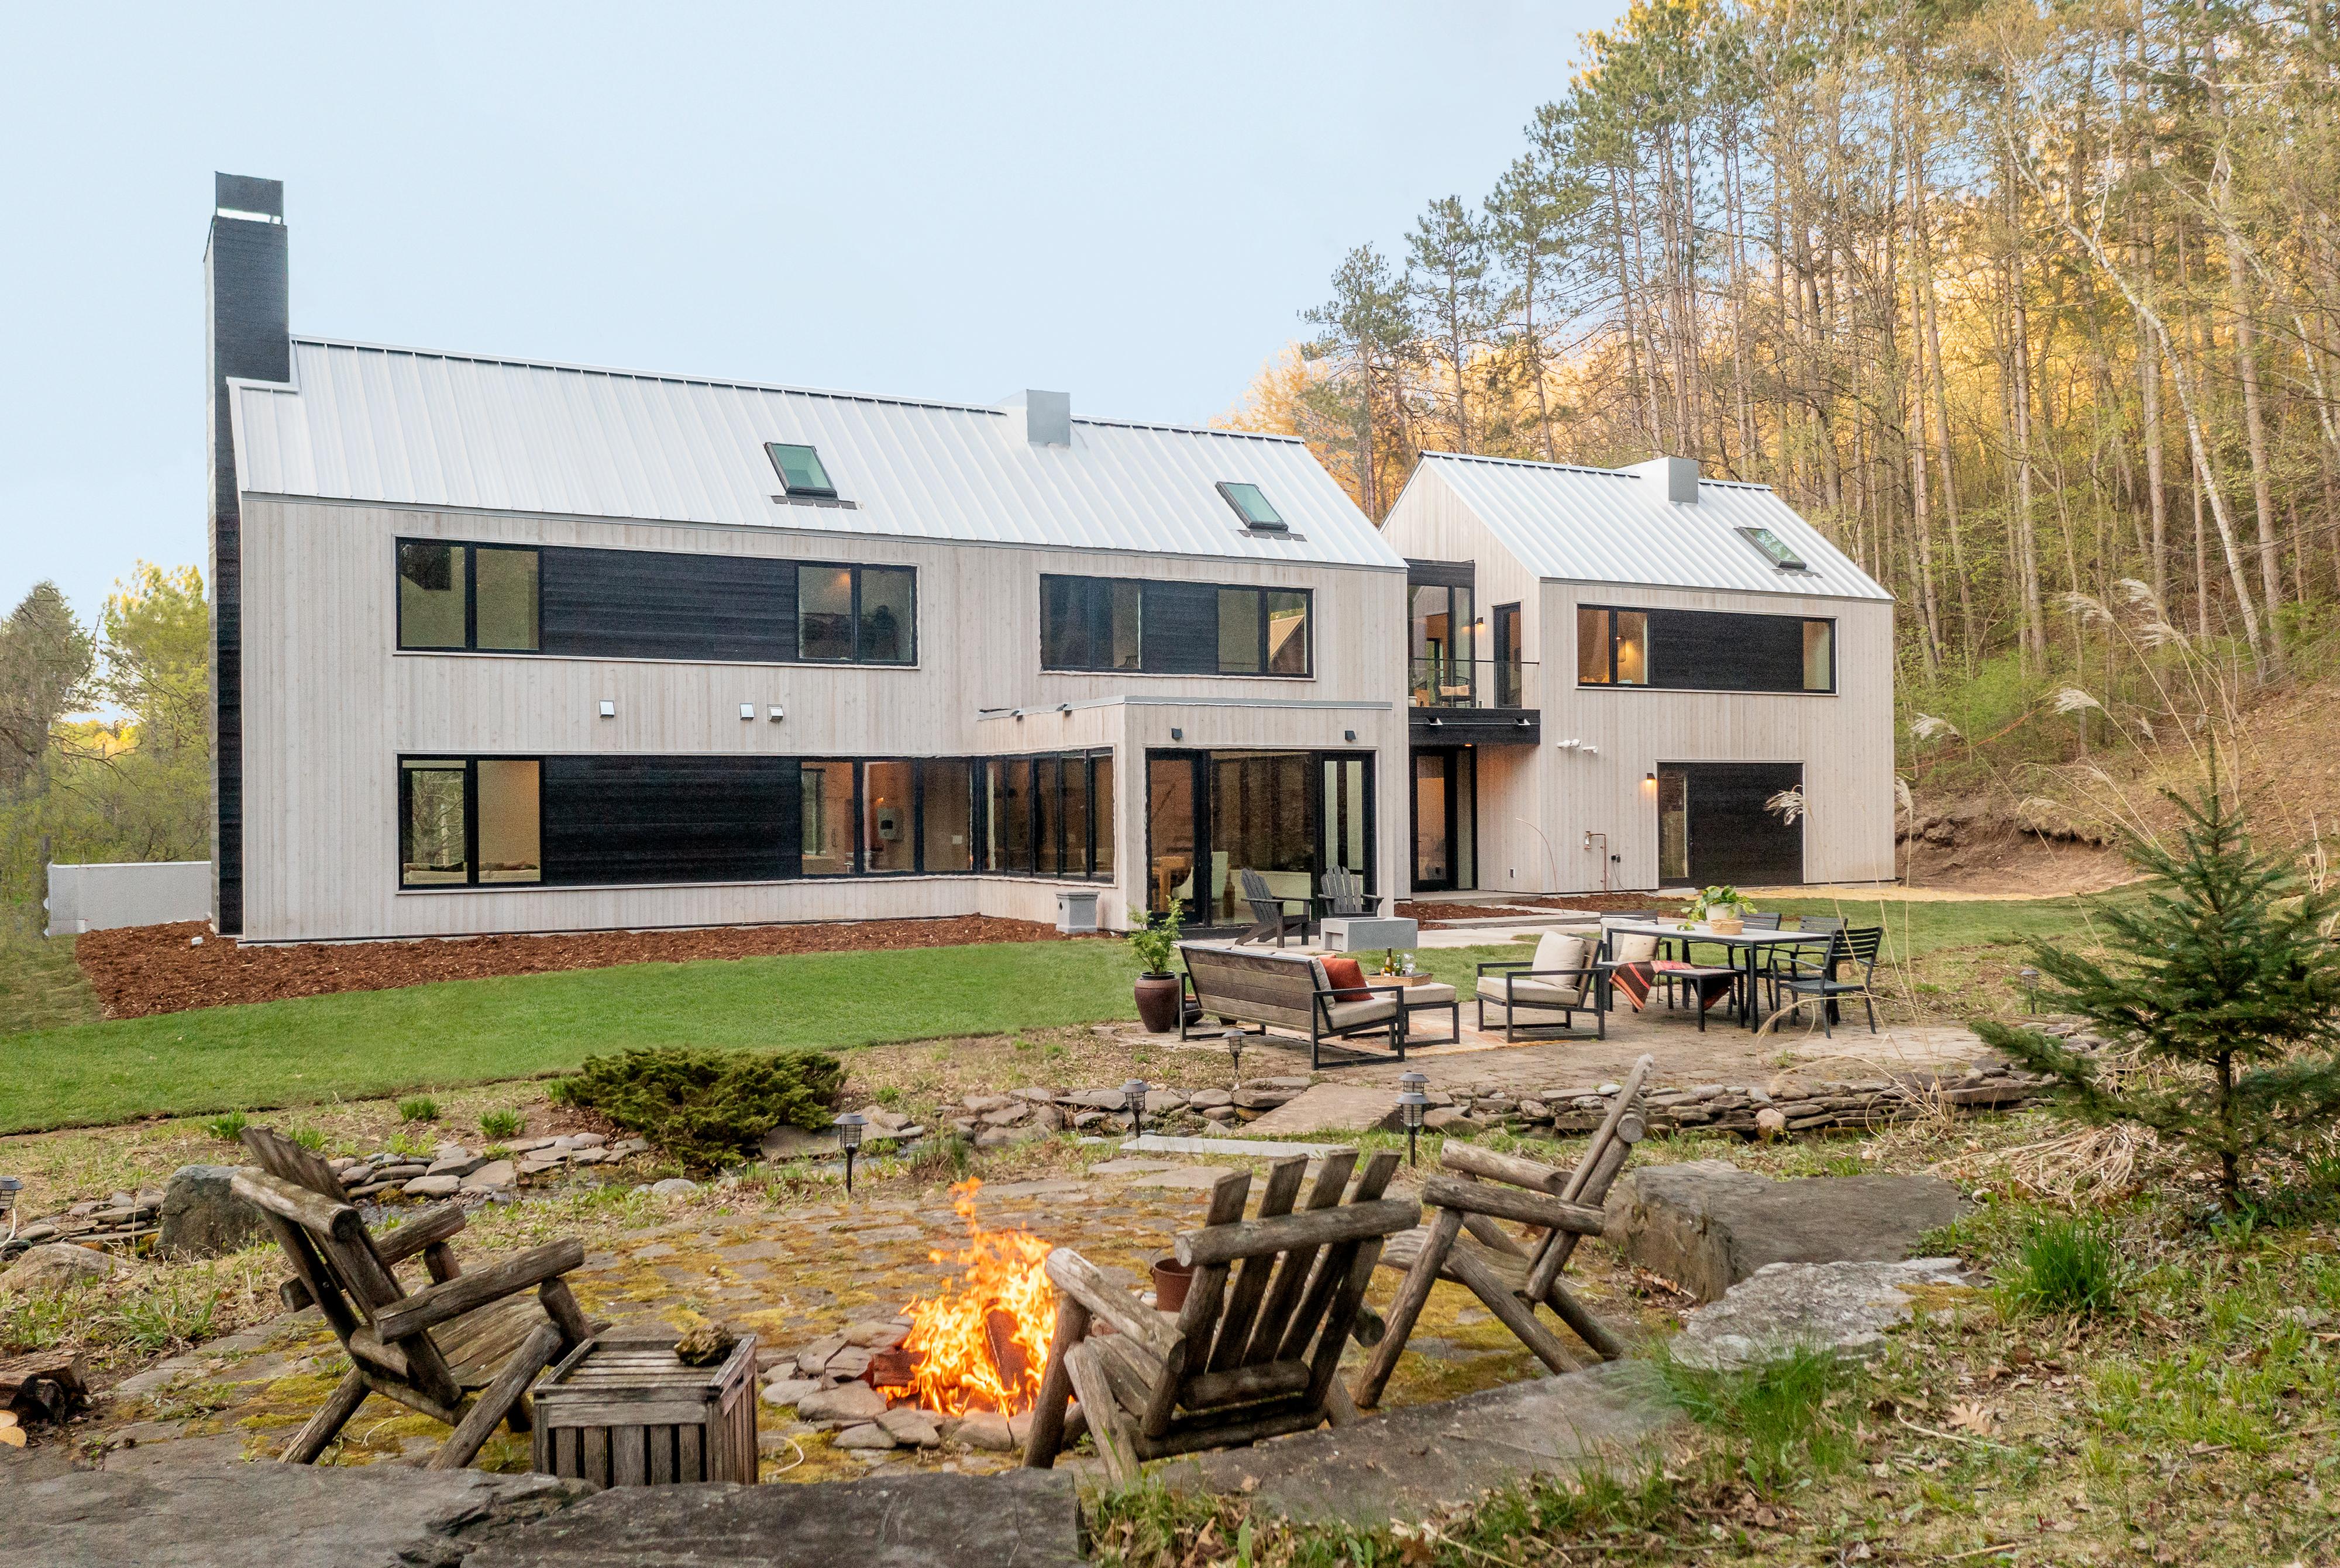 Fall 2021, Idea House, Modern Barnhouse, St. Paul, MN, exterior rear view with patio